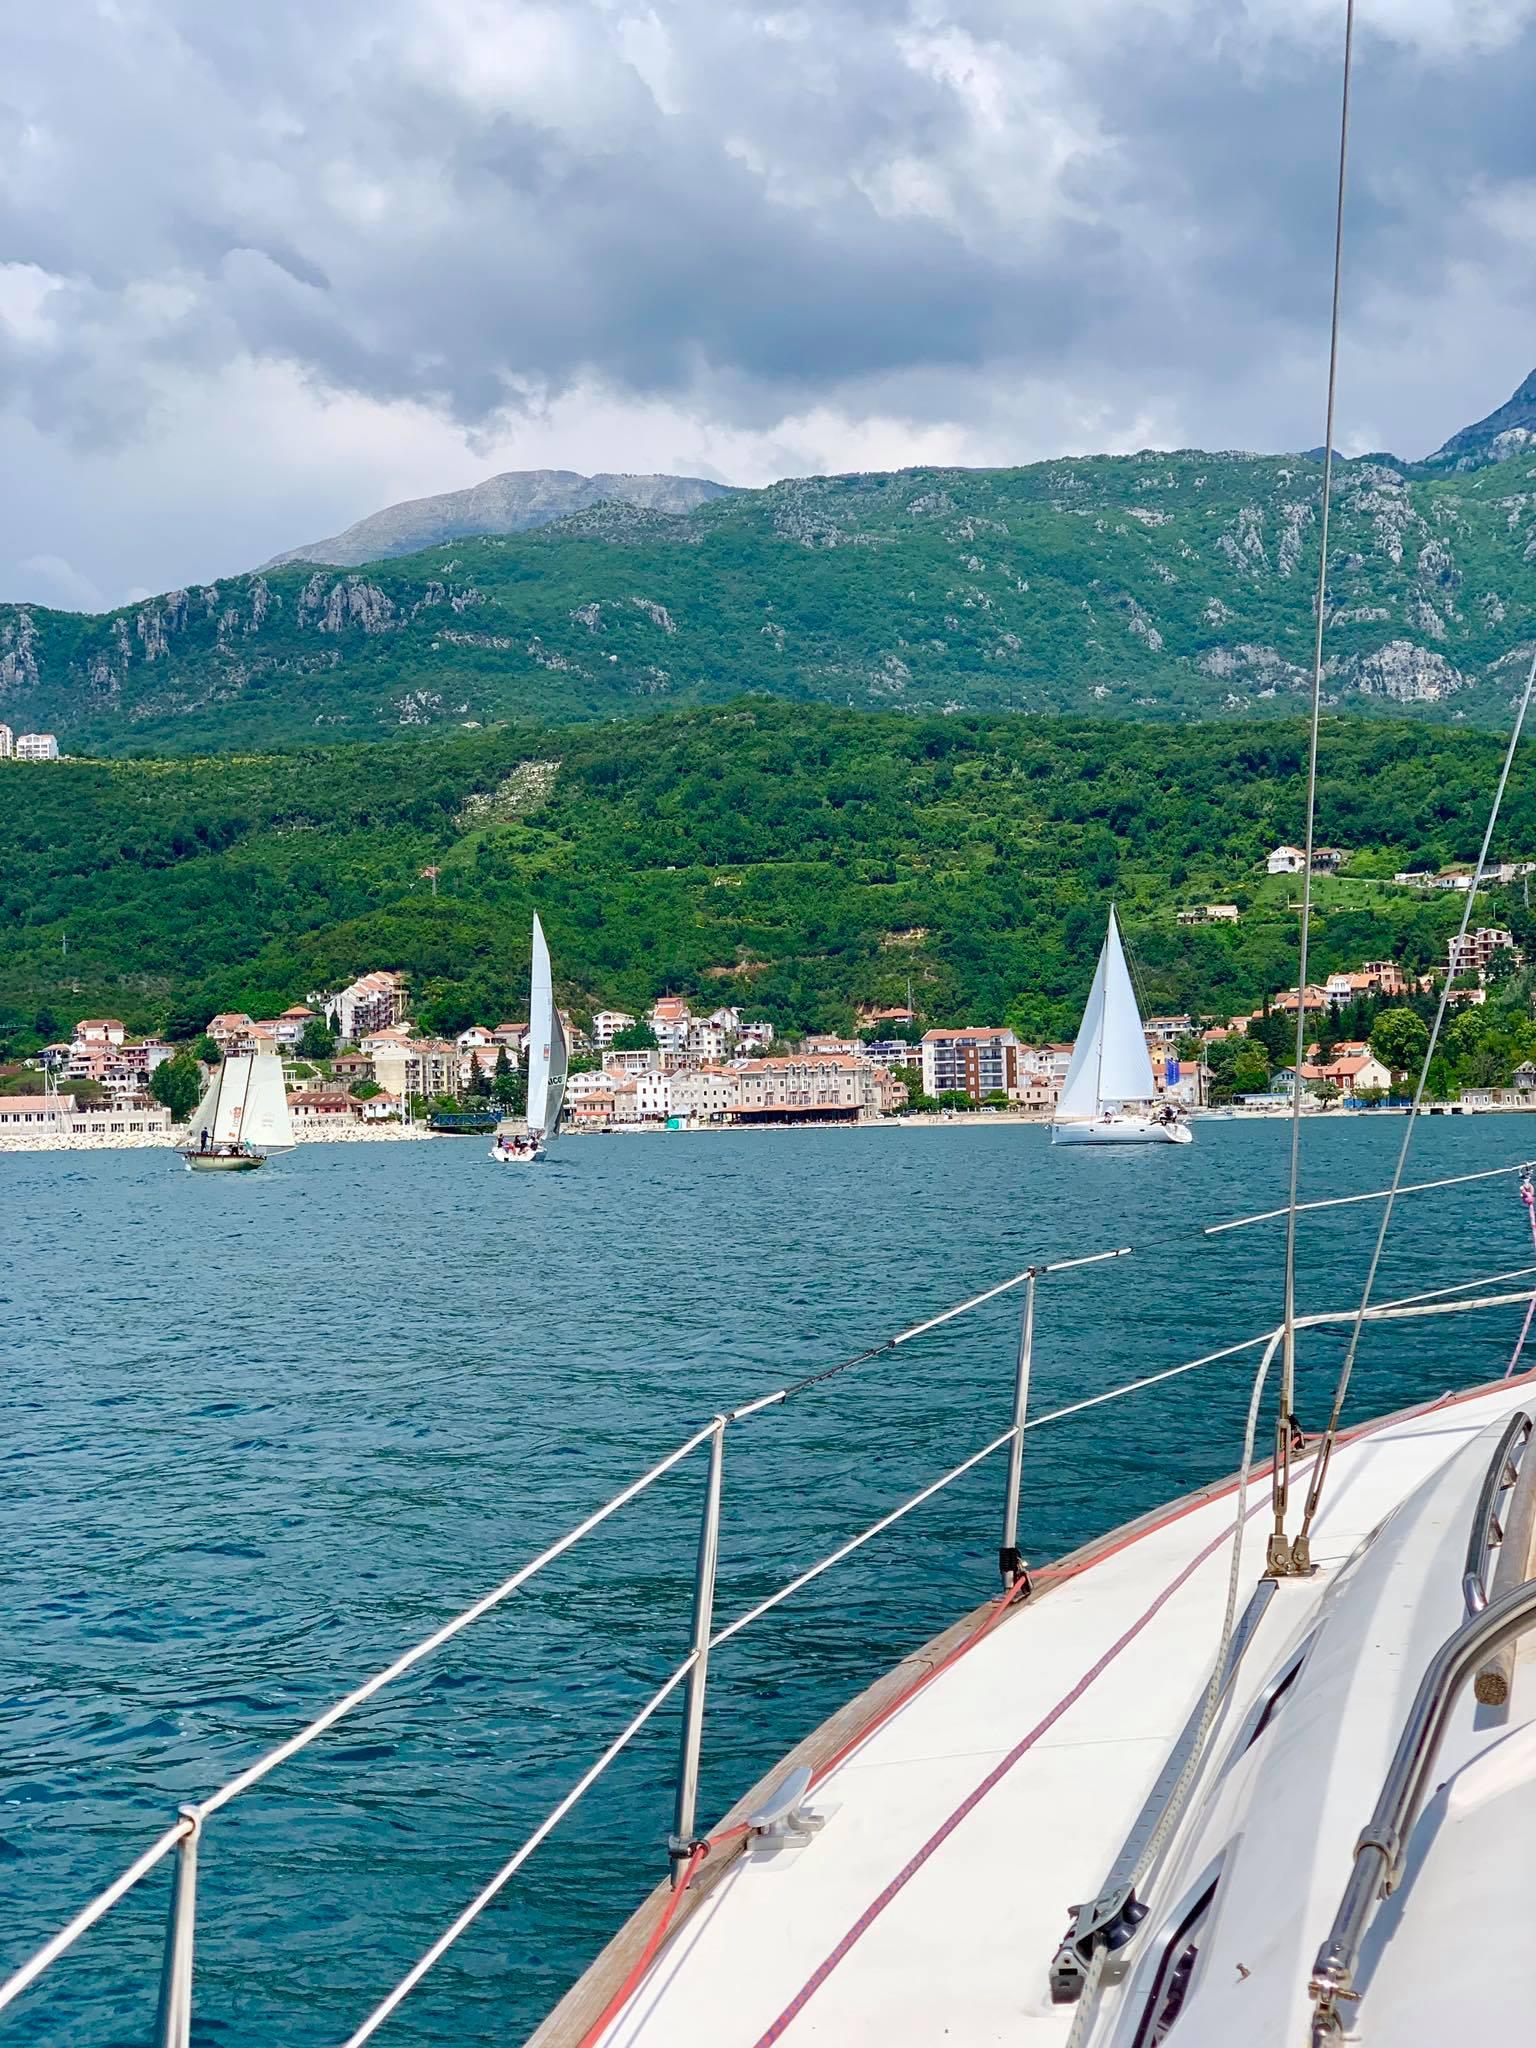 Expat Life in Montenegro Day 2 First full day in Herceg Novi5.jpg